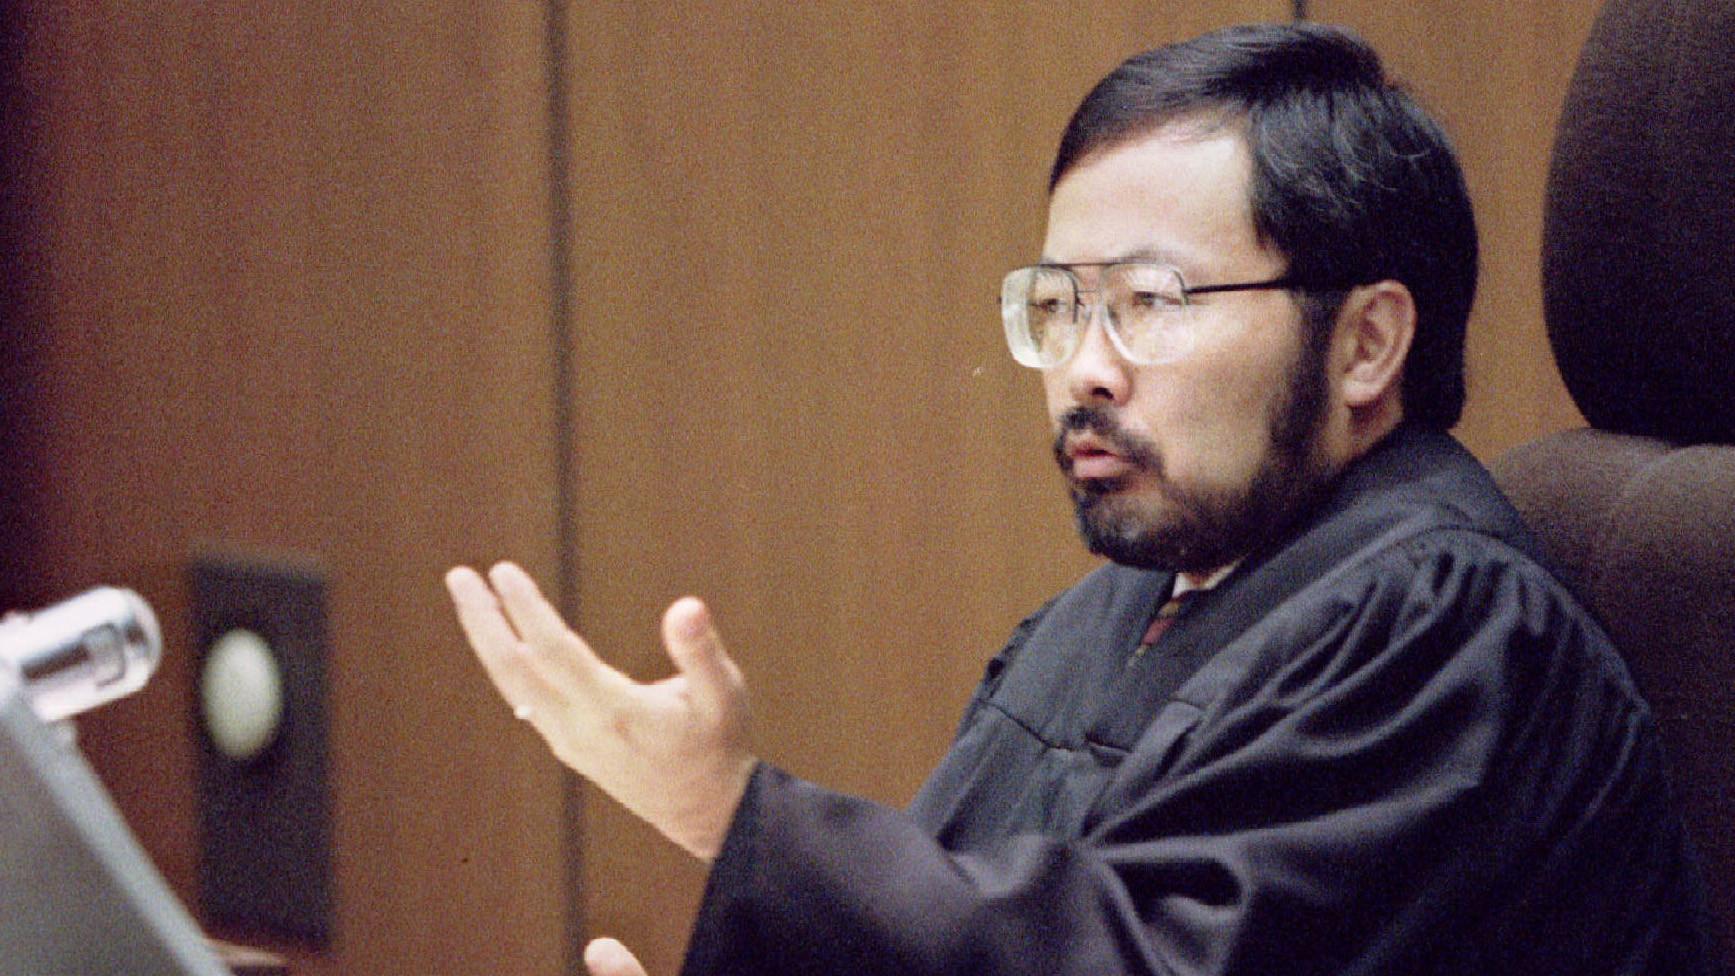 Judge Ito